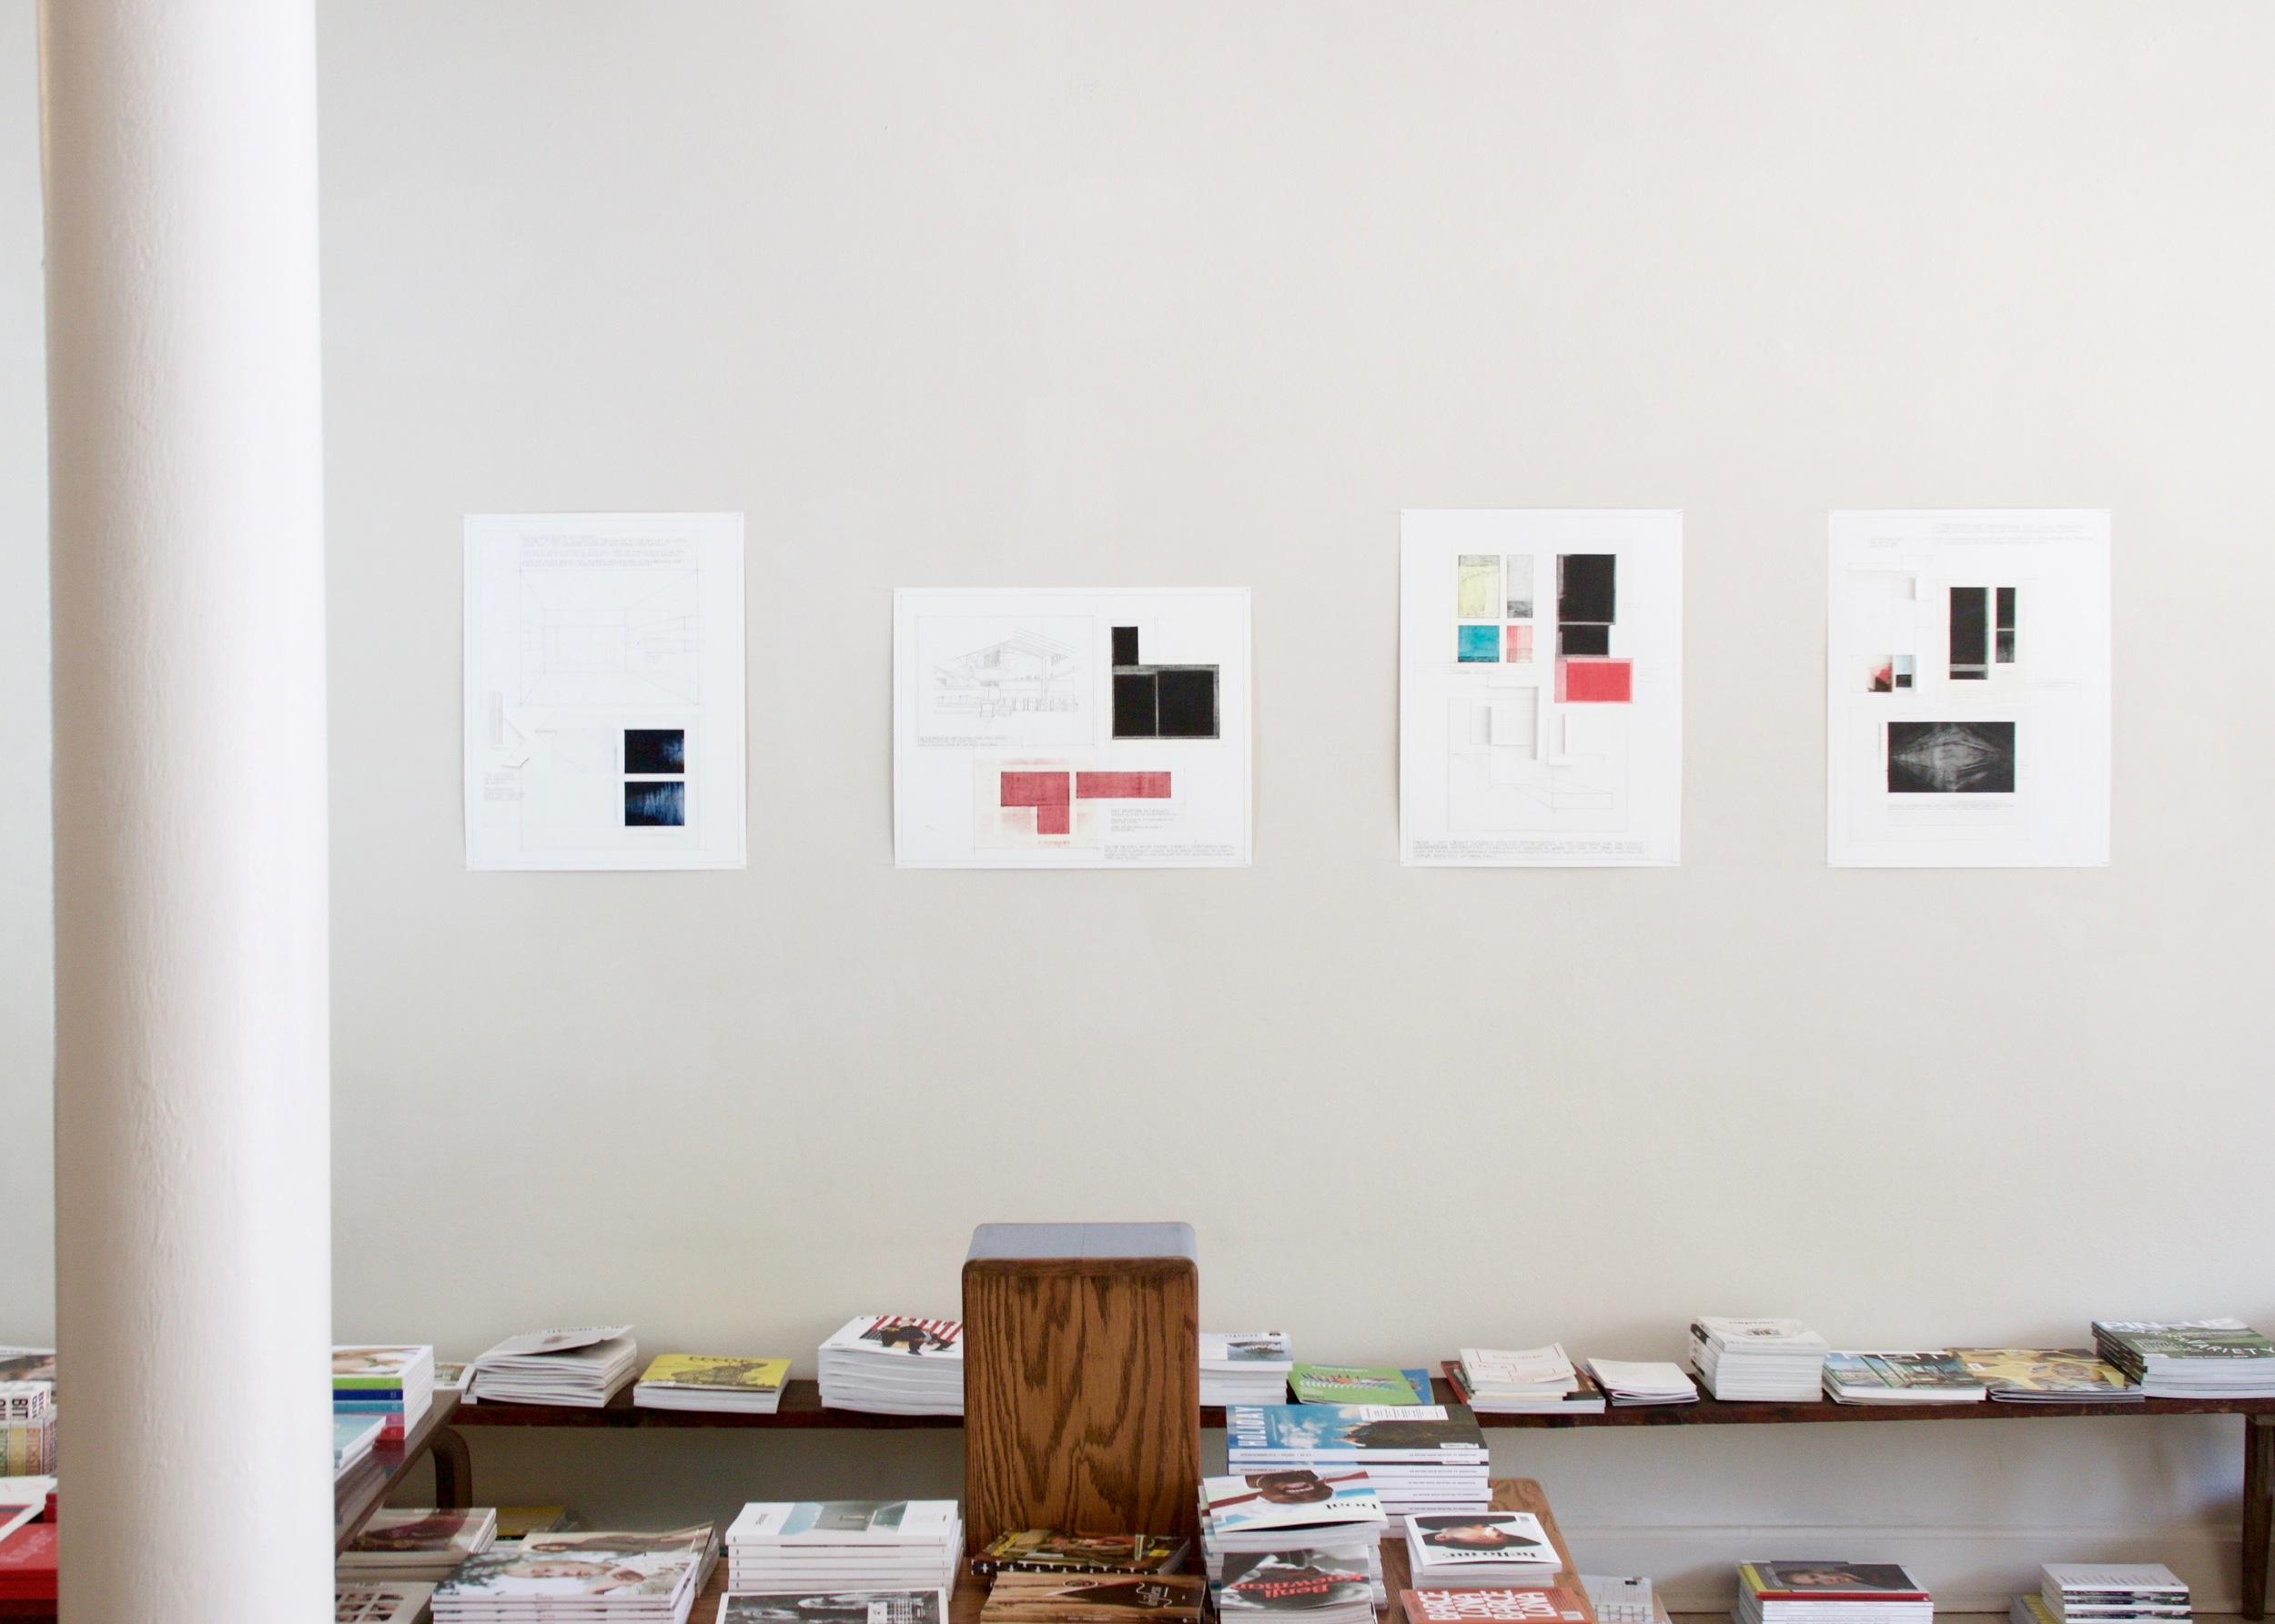 installation view, Deb Sokolow for Syntax Season, 2016